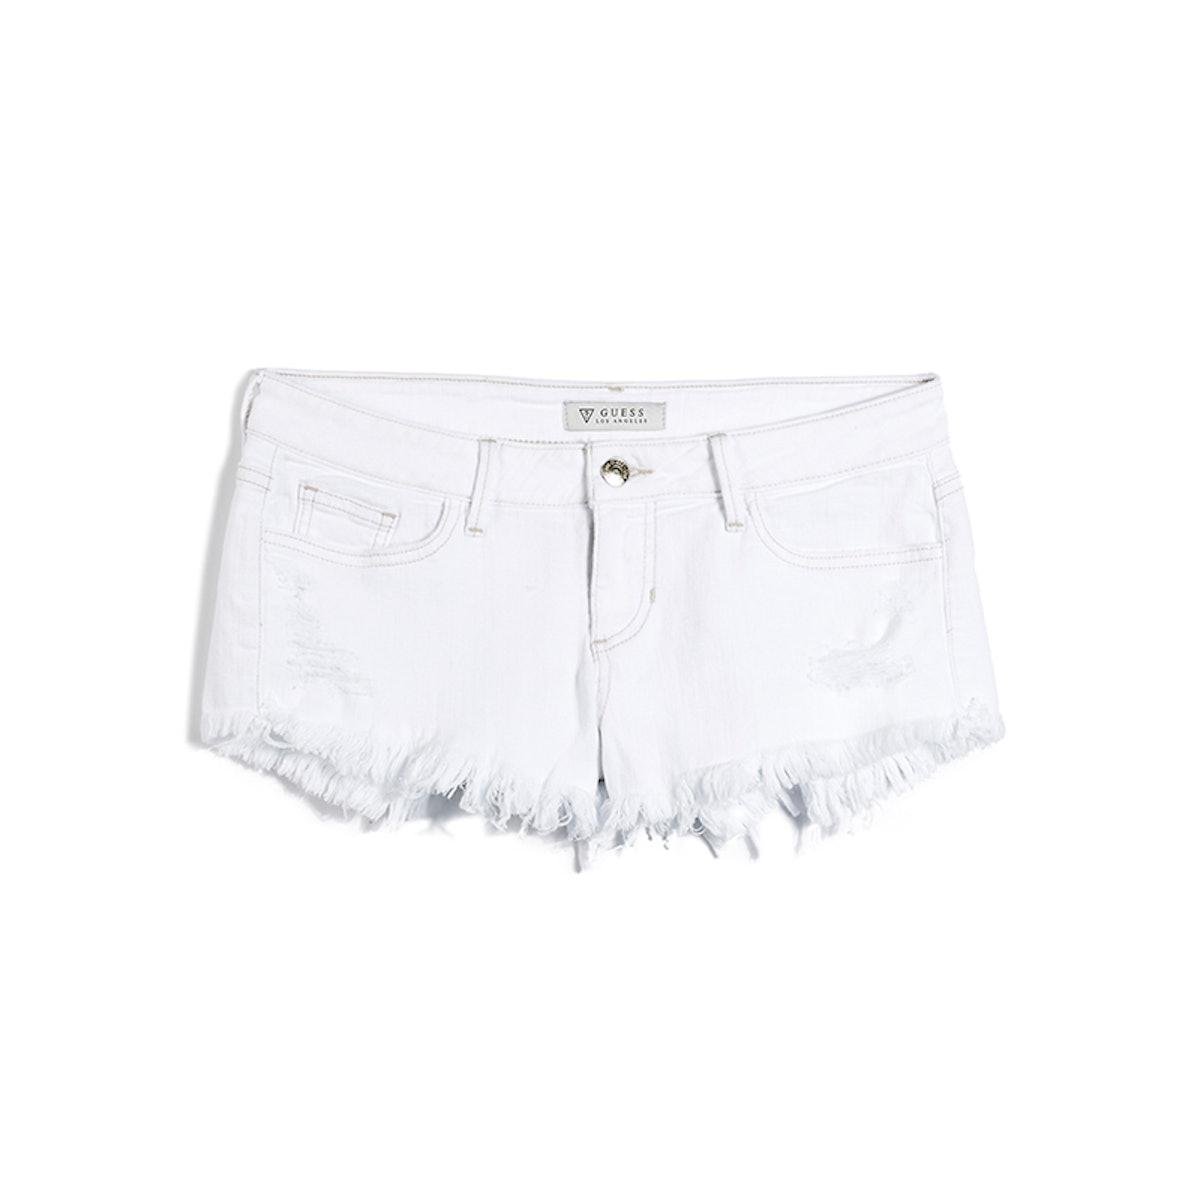 Kate Cutoff Denim Shorts in White Overdyed Destroy Wash